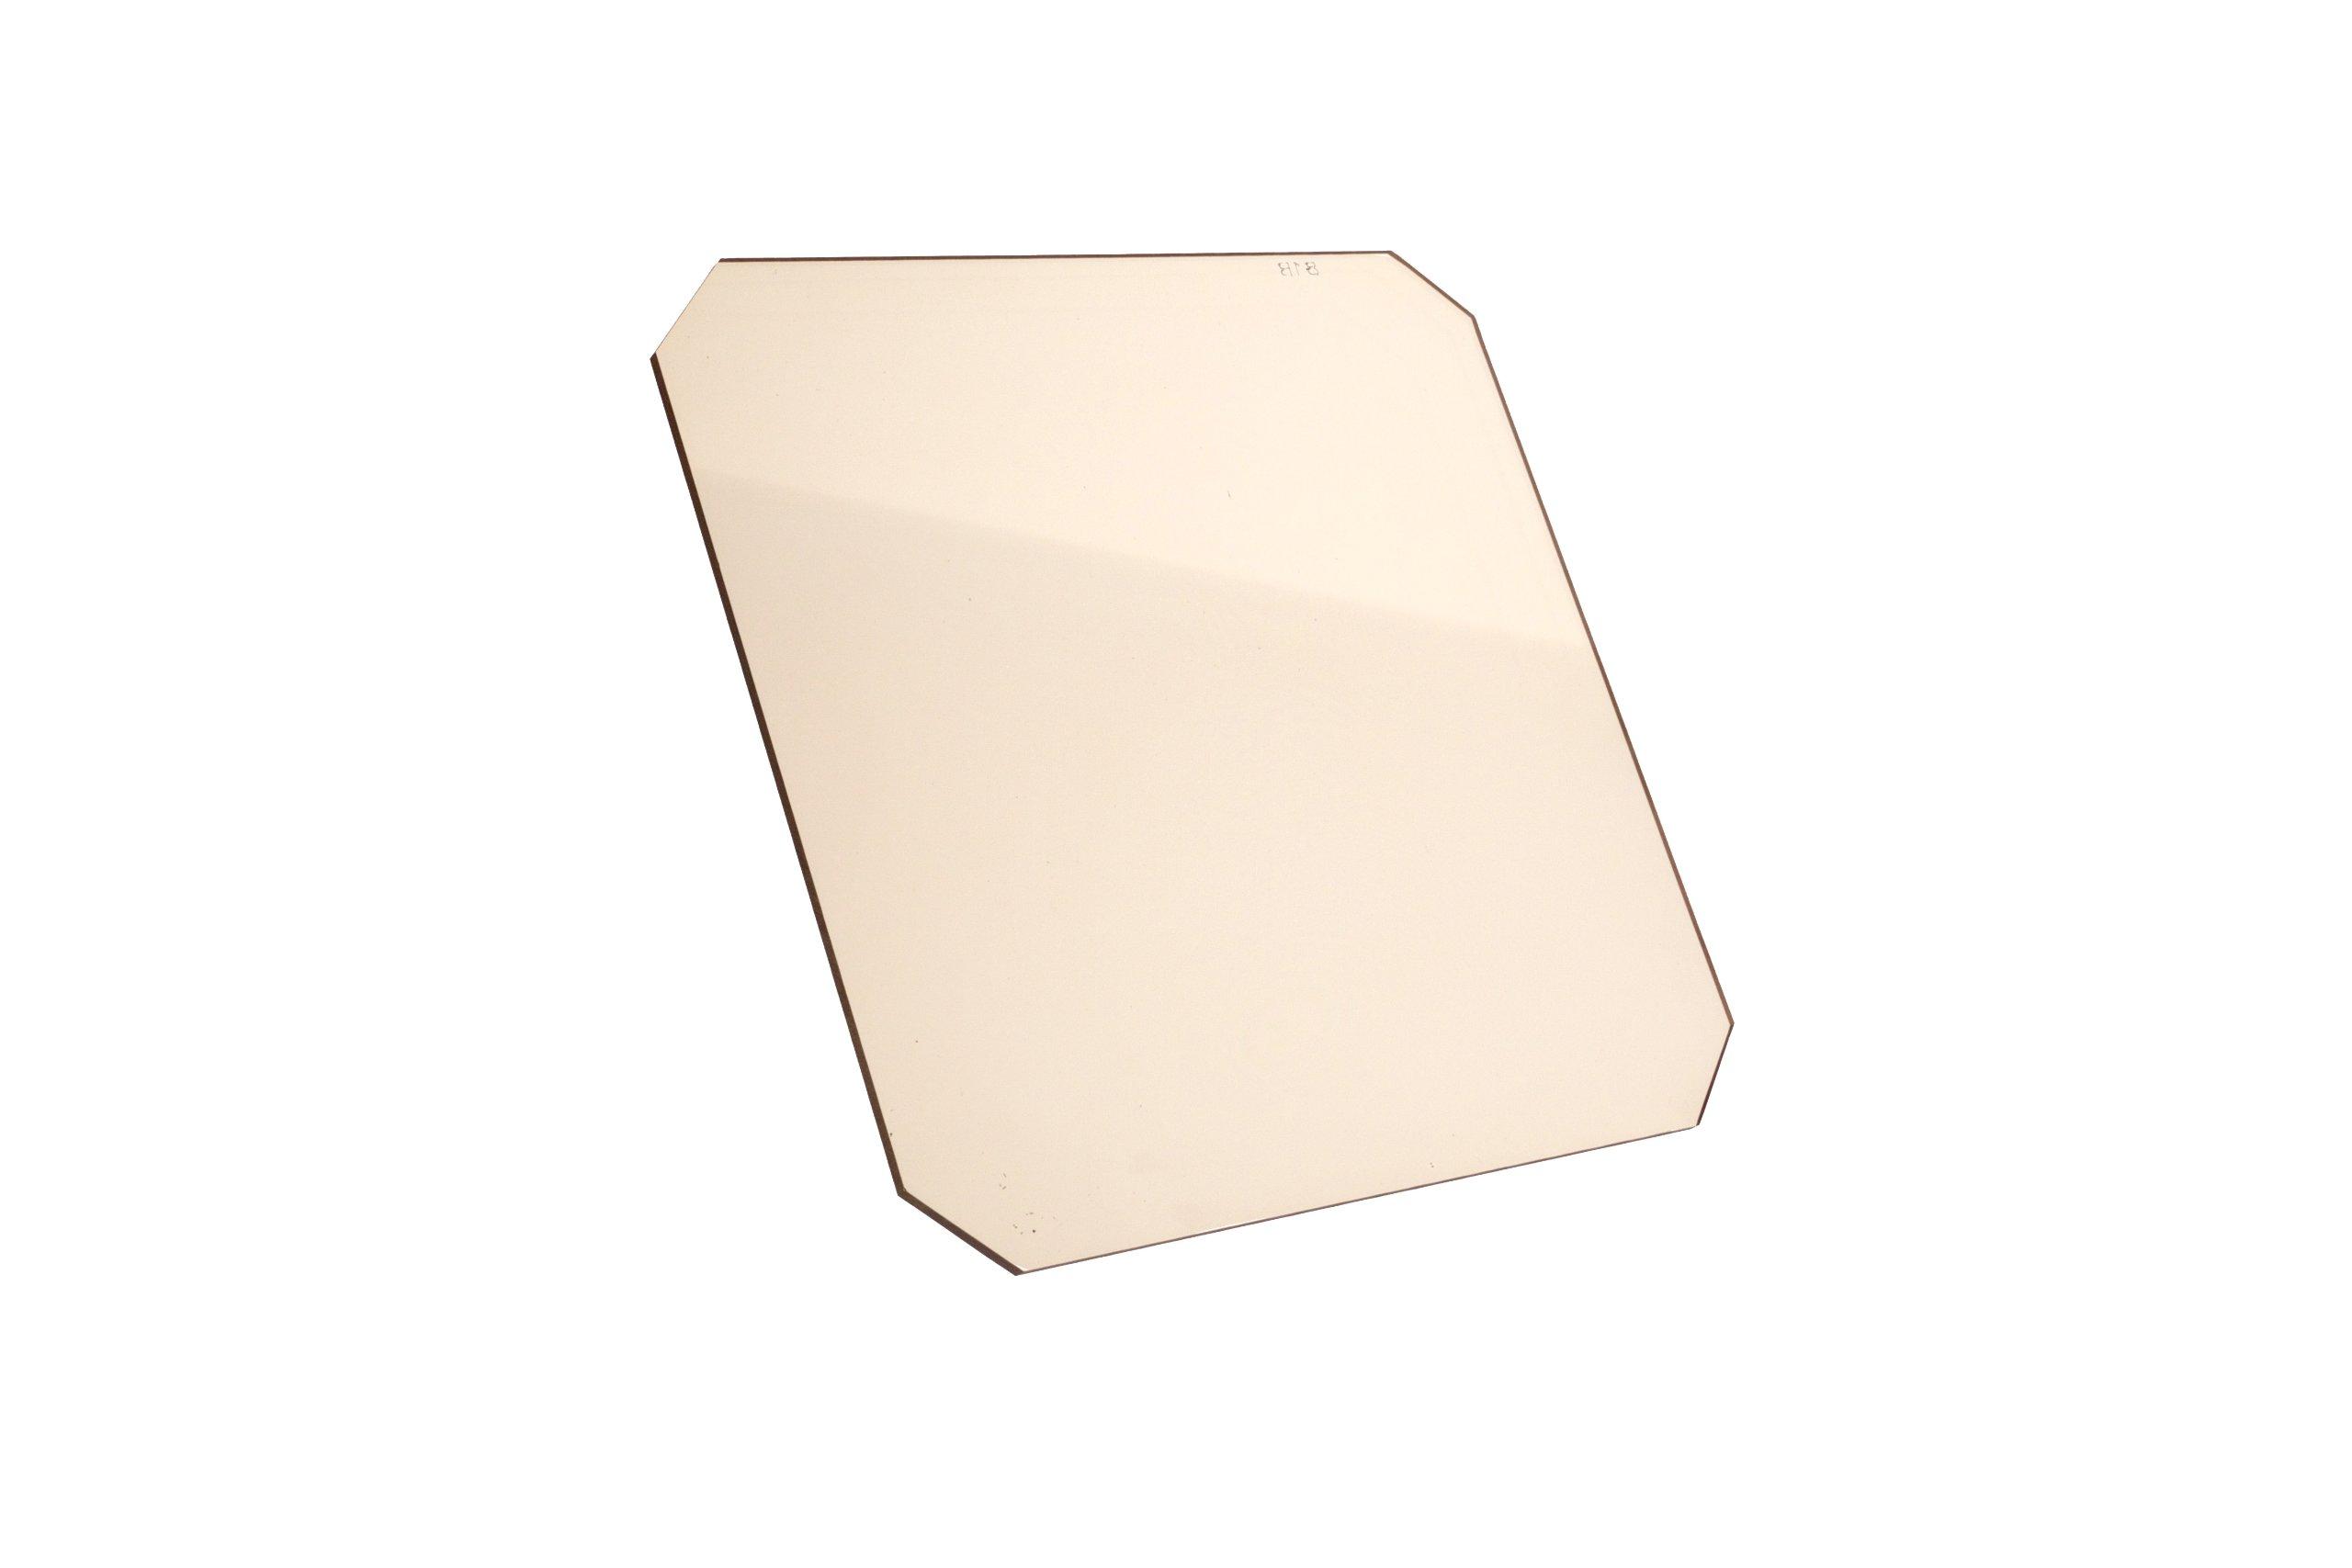 Formatt-Hitech 85x85mm (3.35x3.35'') Resin Color Temperature 81b